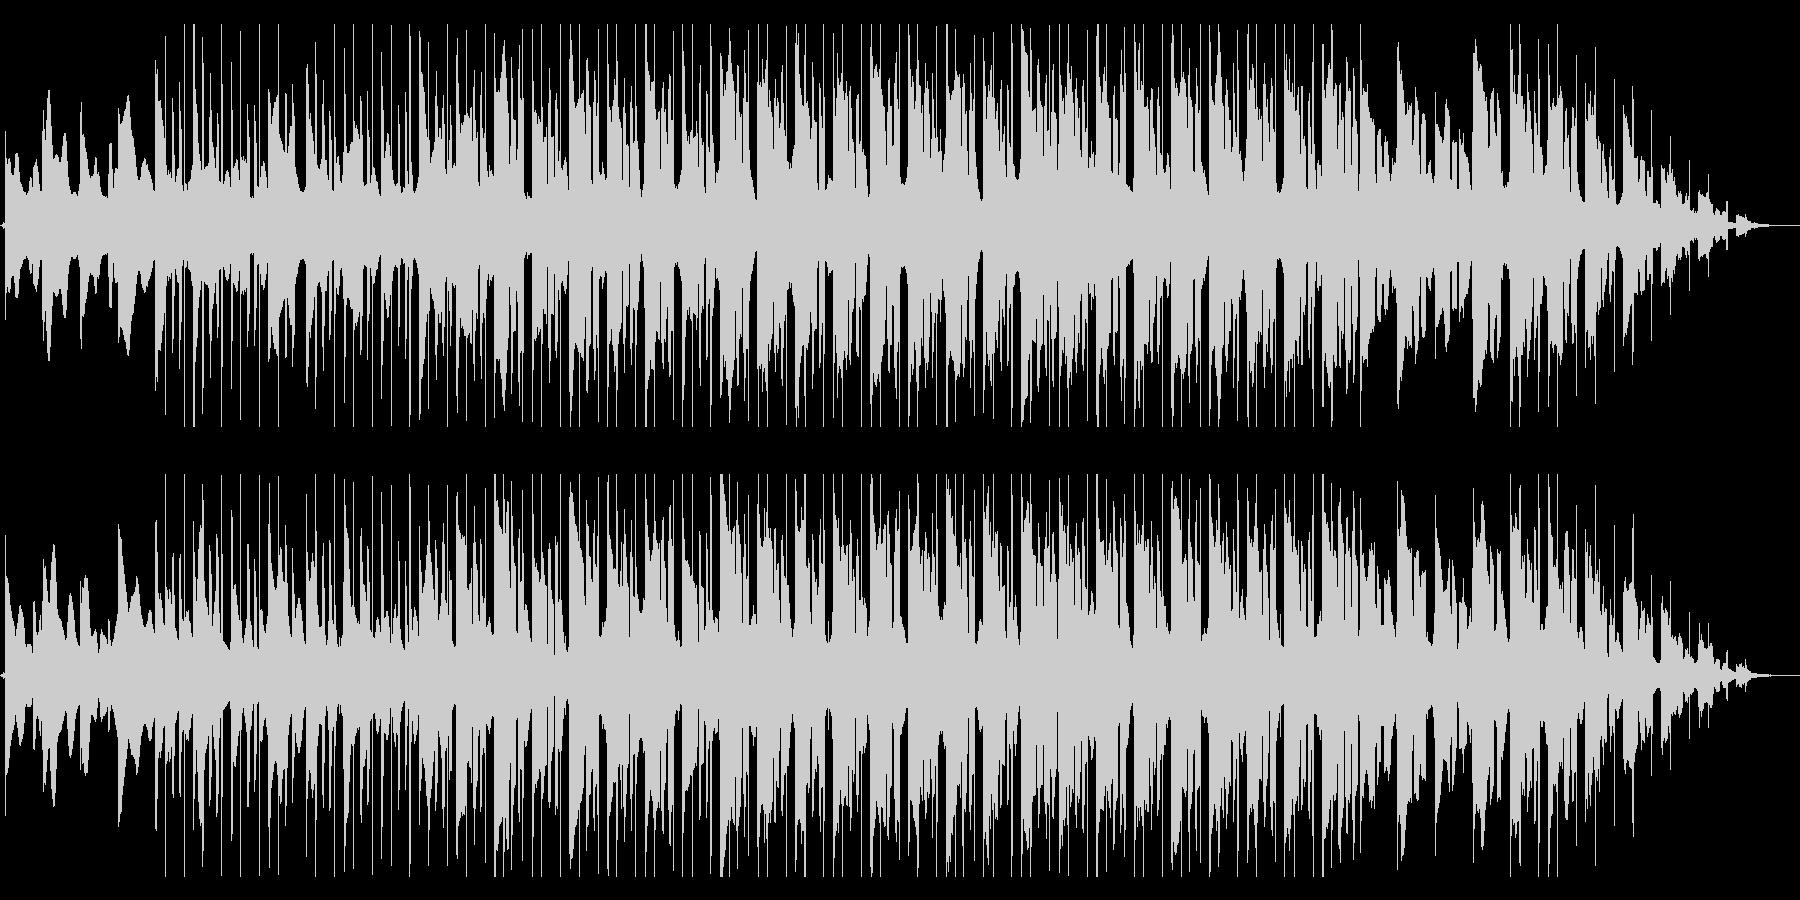 Lofi Hip Hop 02の未再生の波形